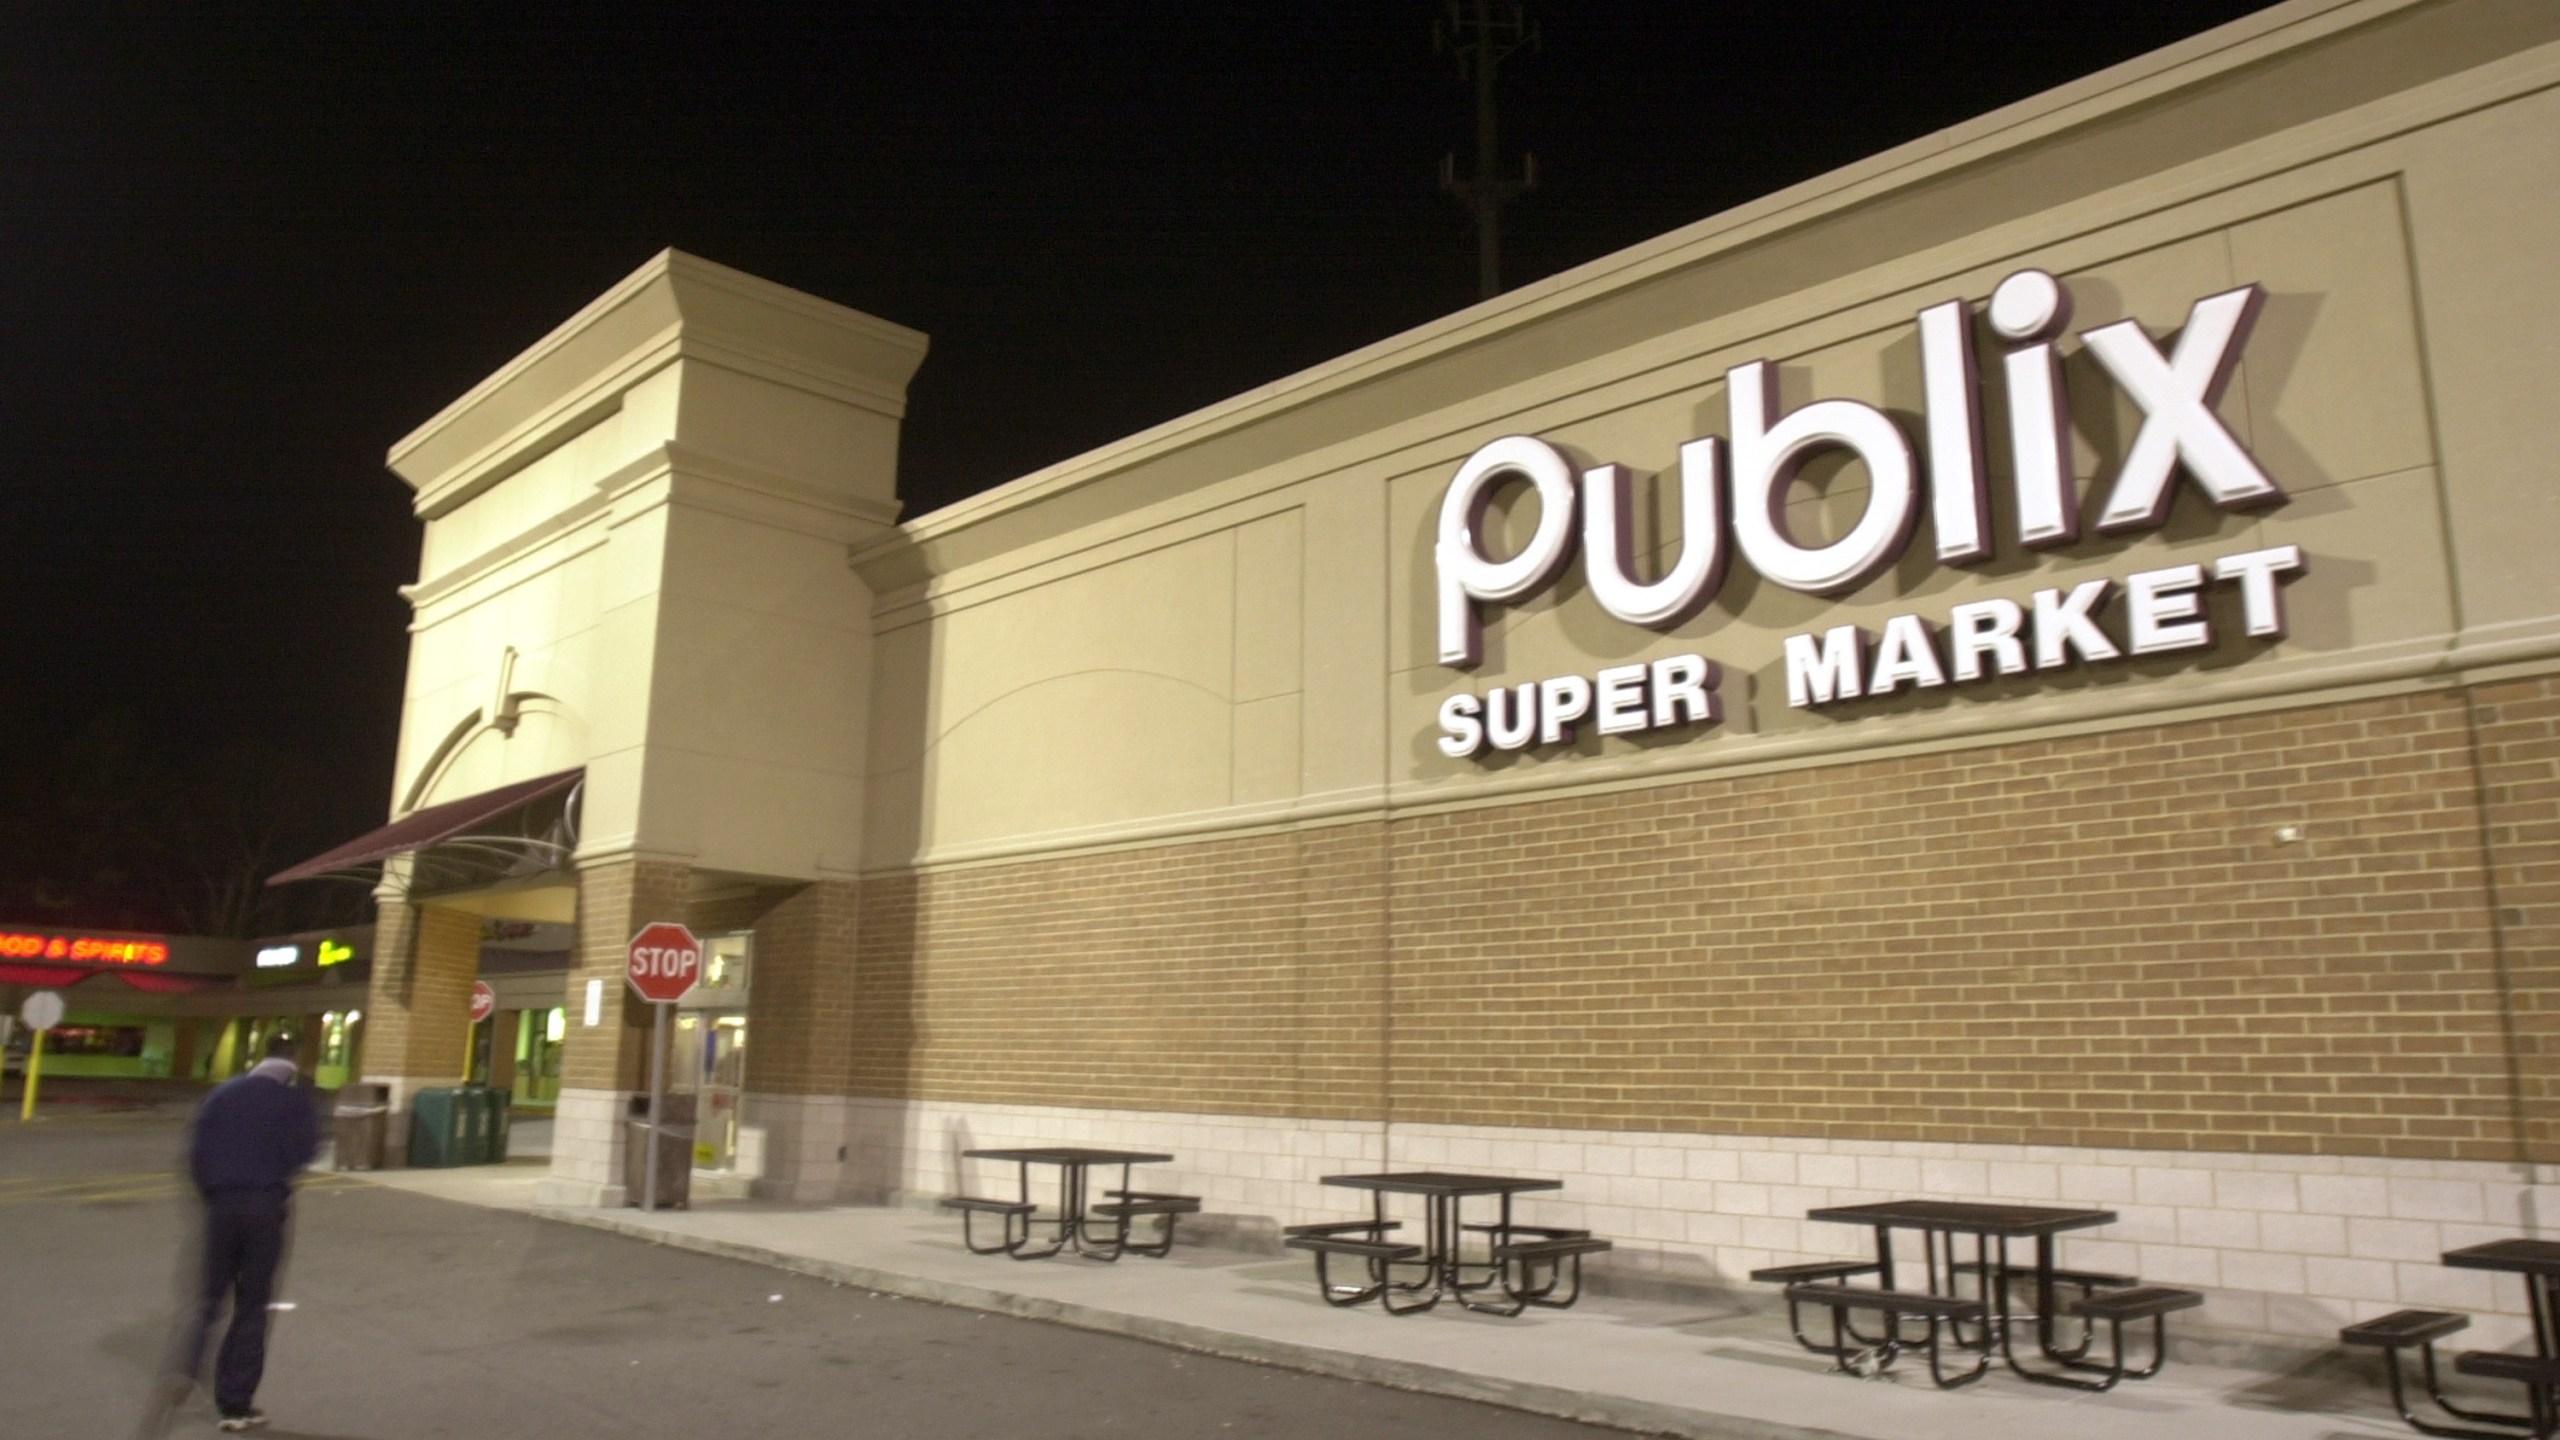 Publix Super Market_706840